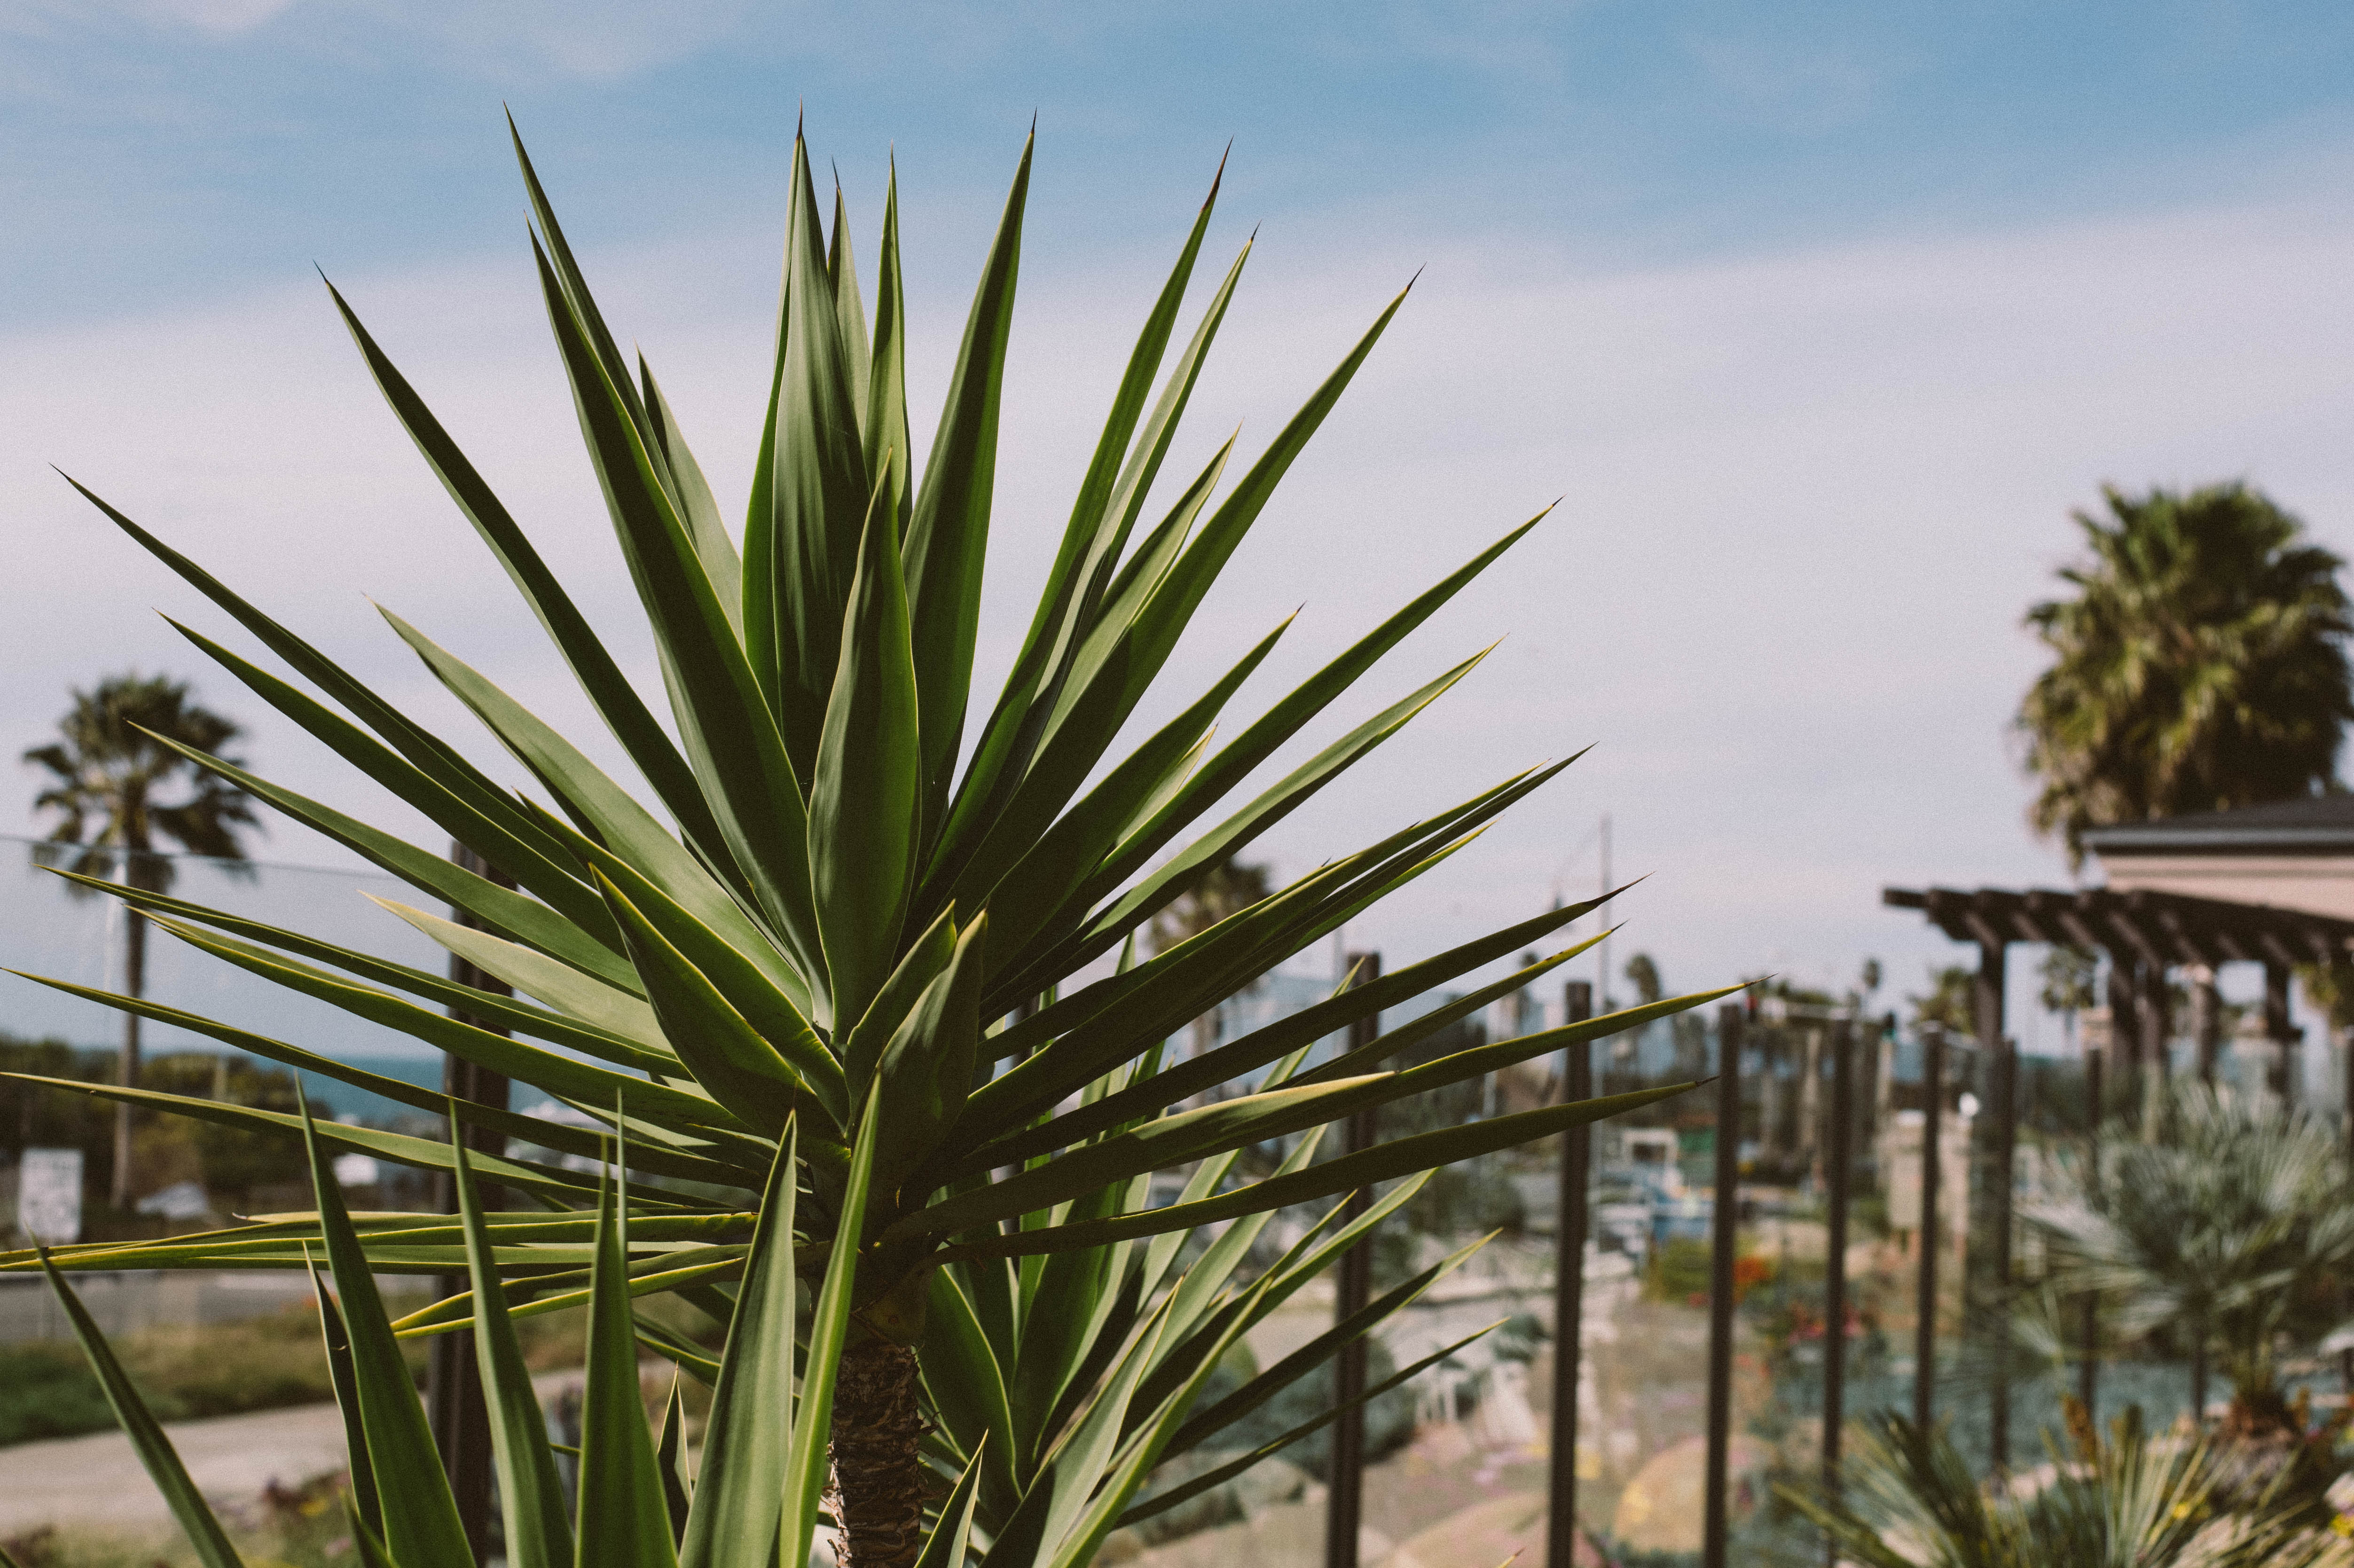 Staycation: Cape Rey Carlsbad